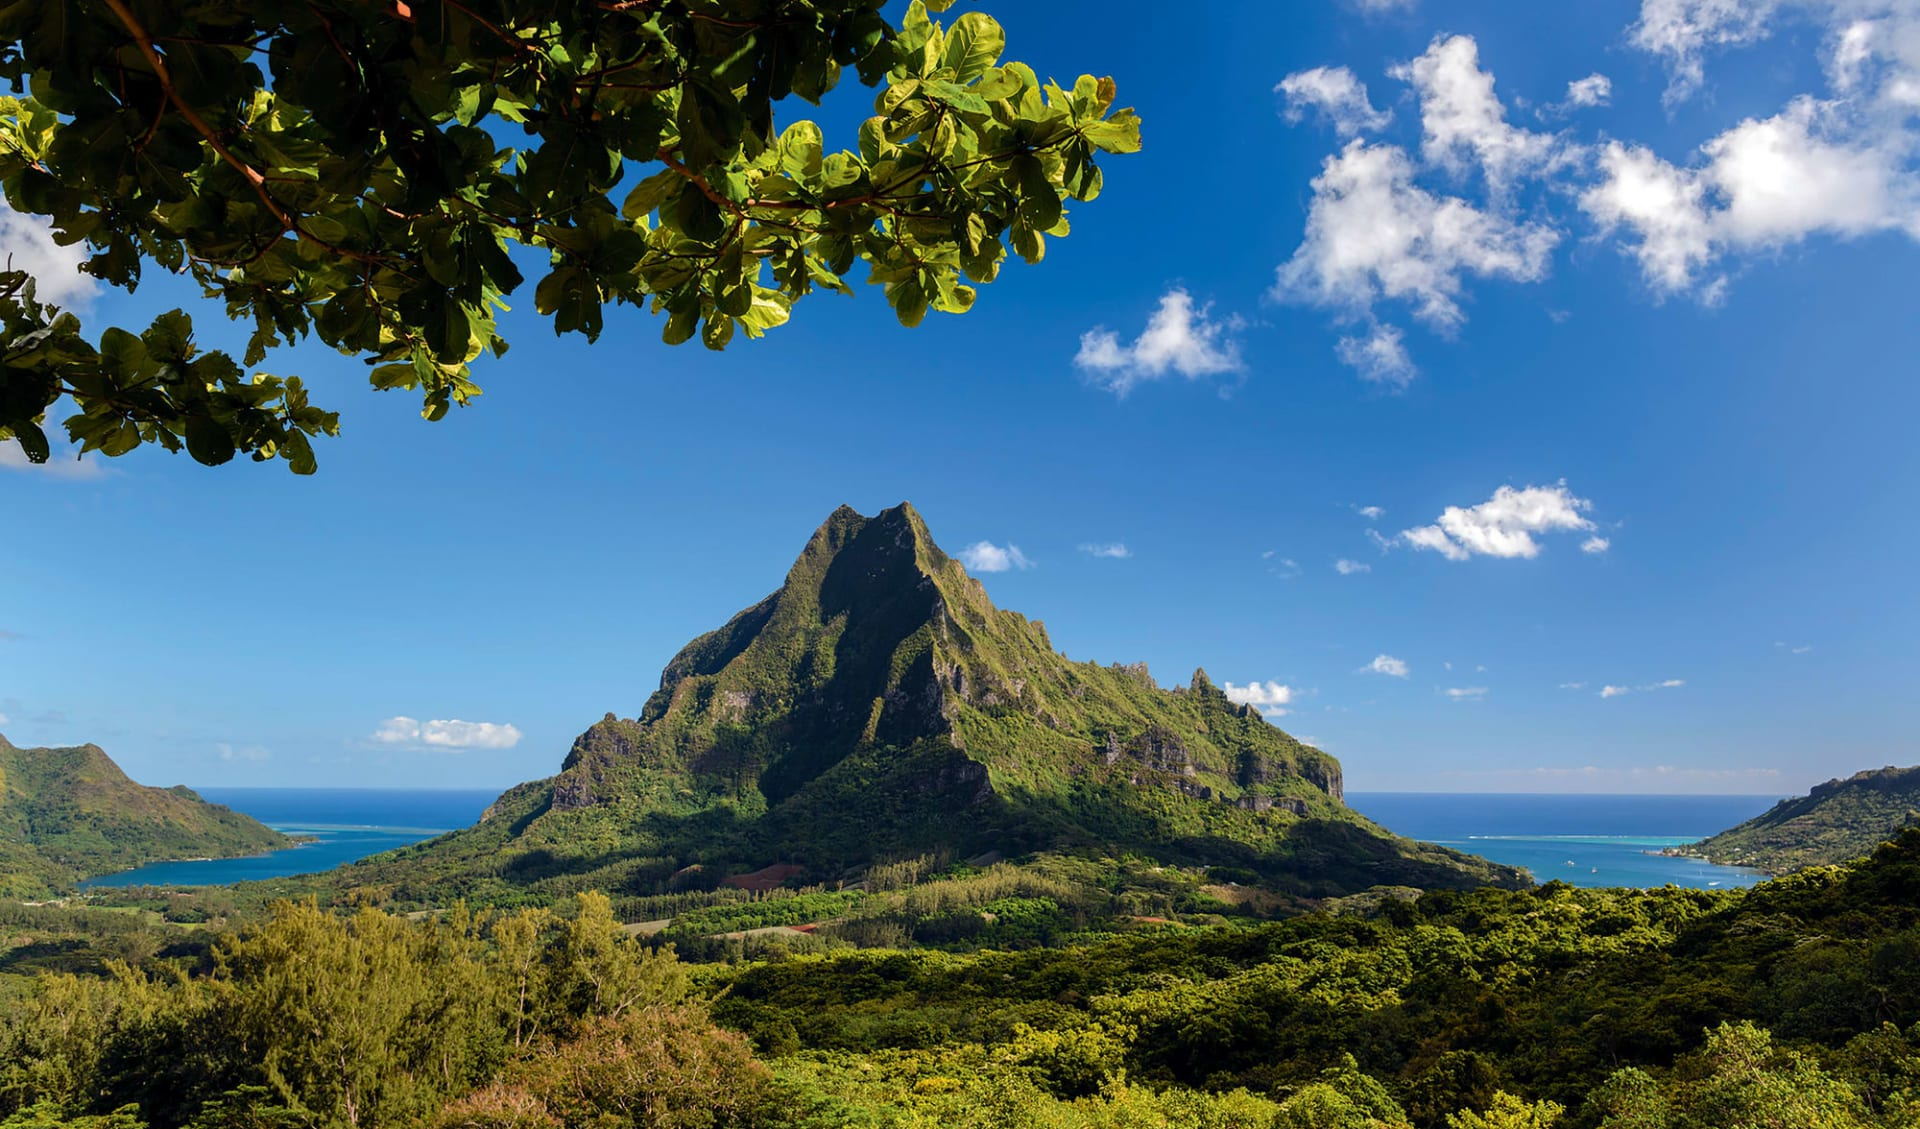 Island Hopping ab Papeete: Französisch Polynesien - Moorea - Mont Rotui